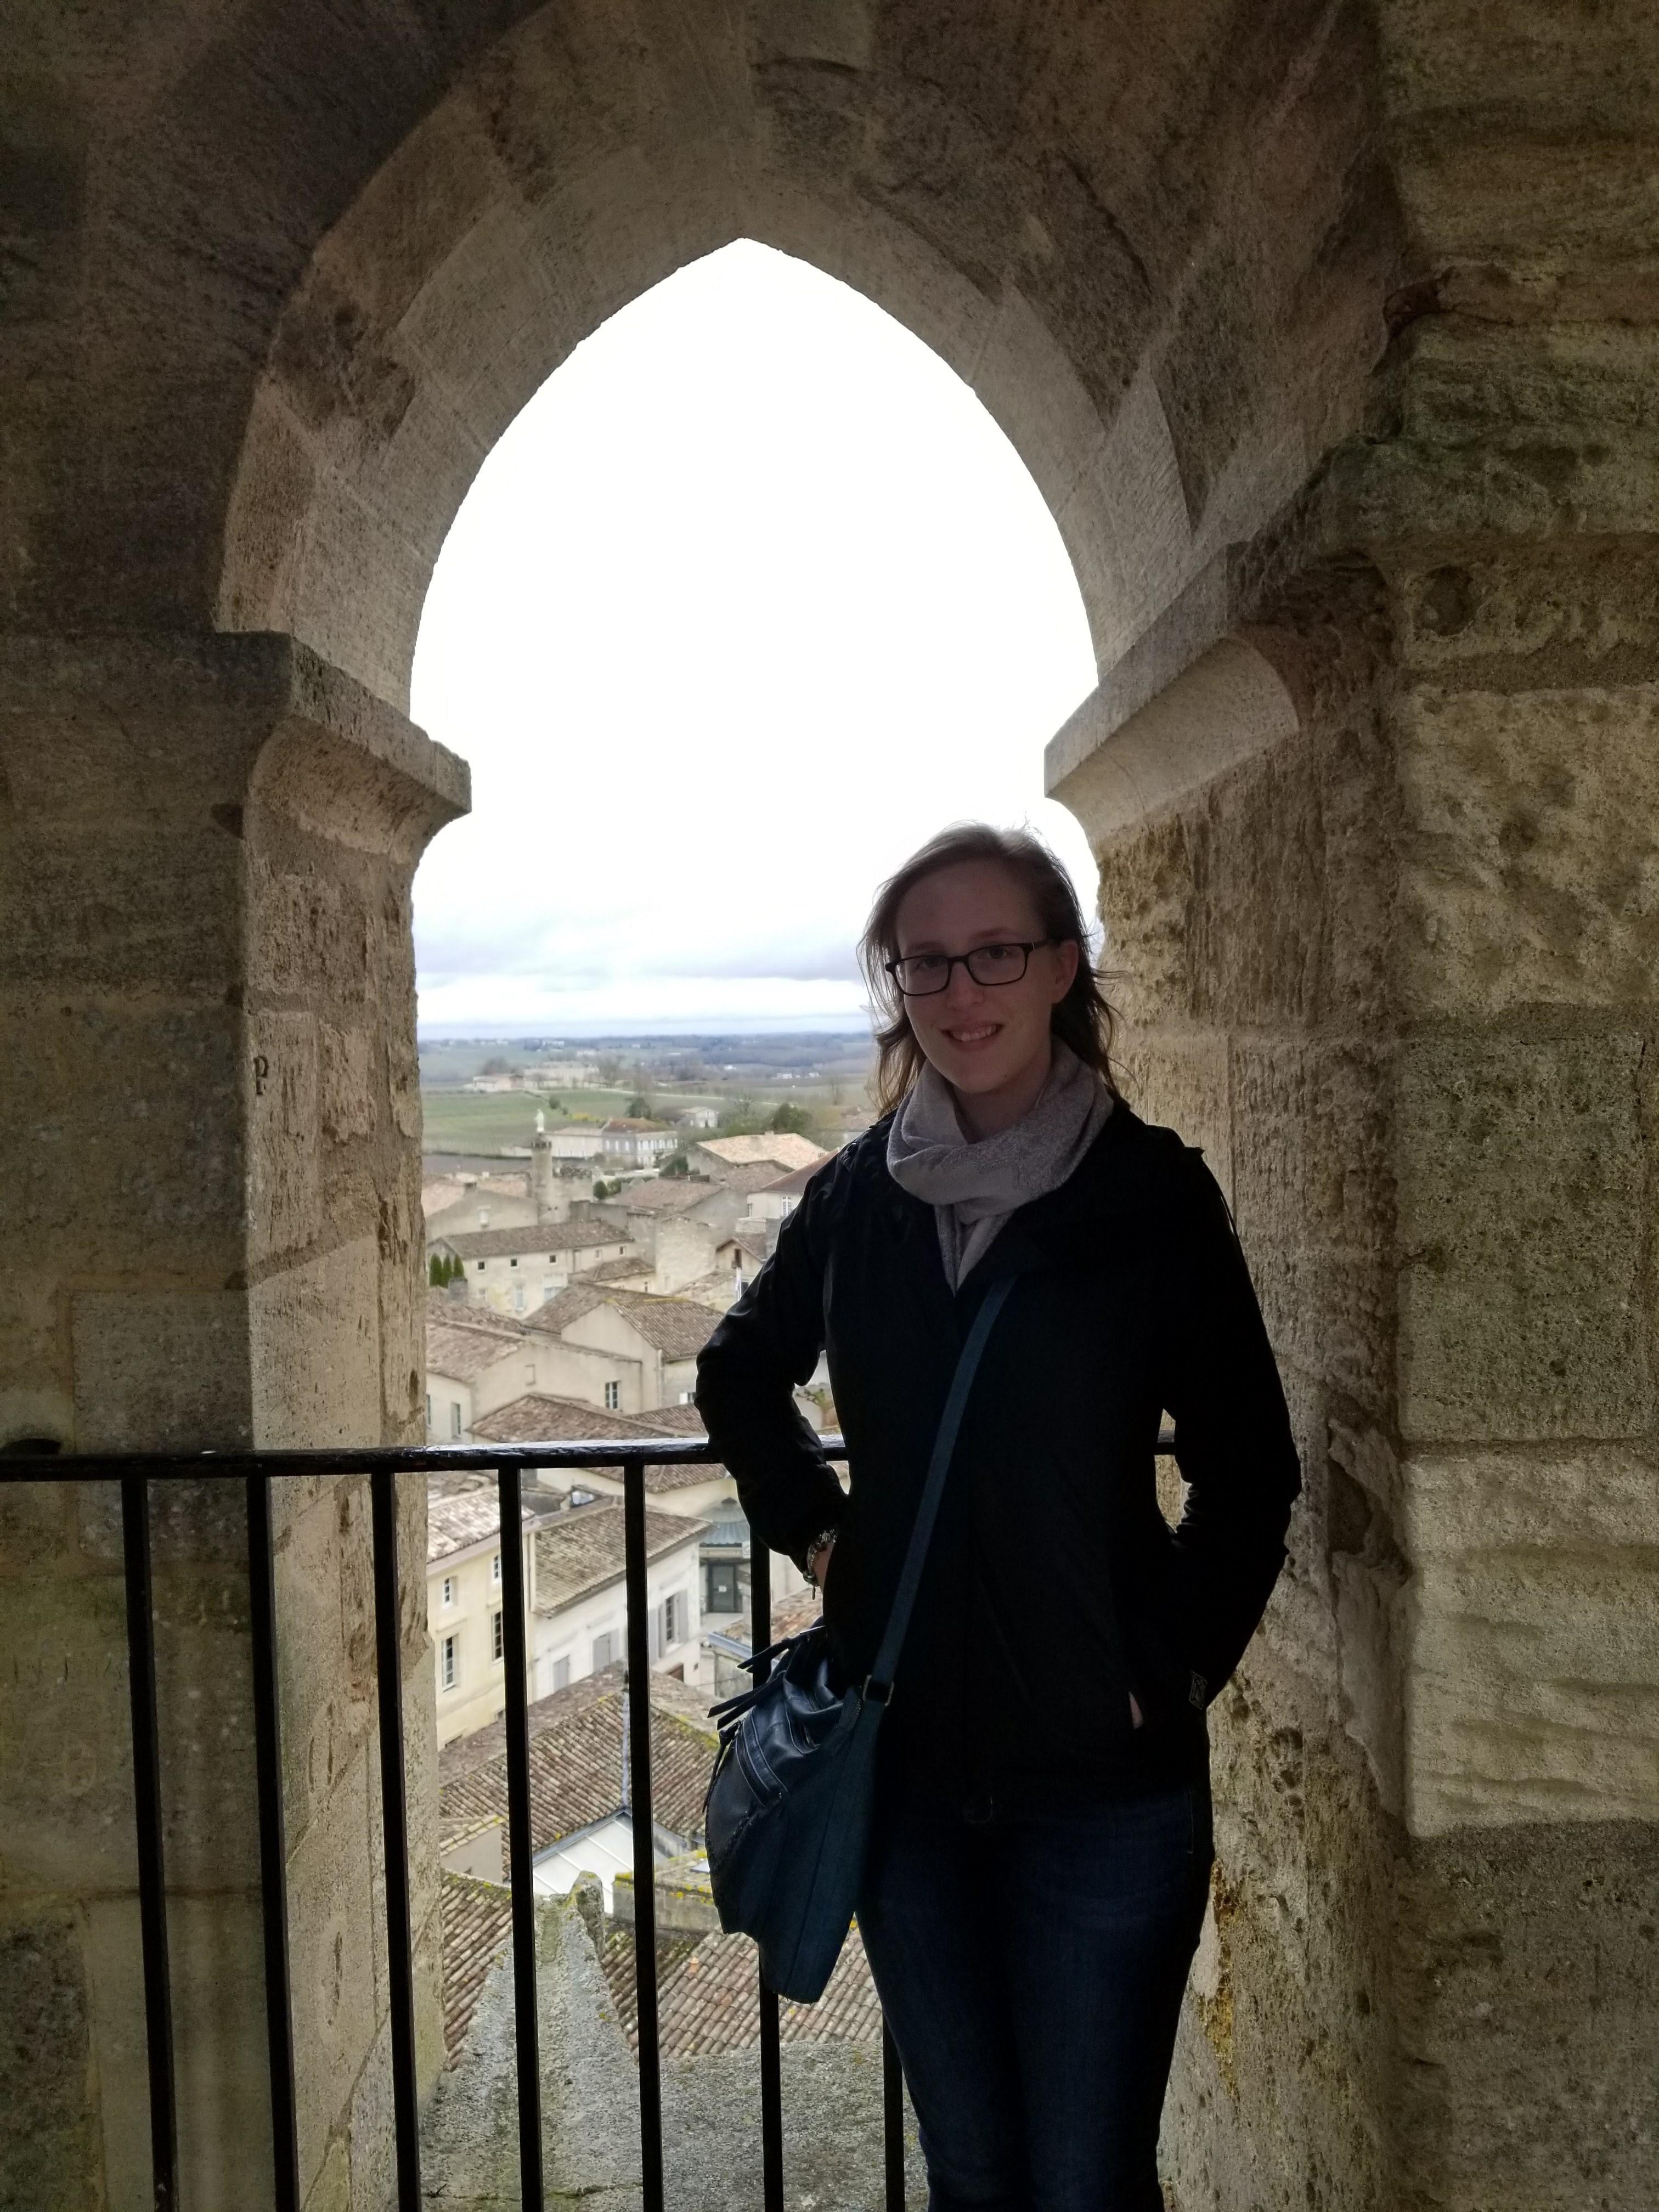 Stephanie Beach, of the Doerrer Group, wins prestigious